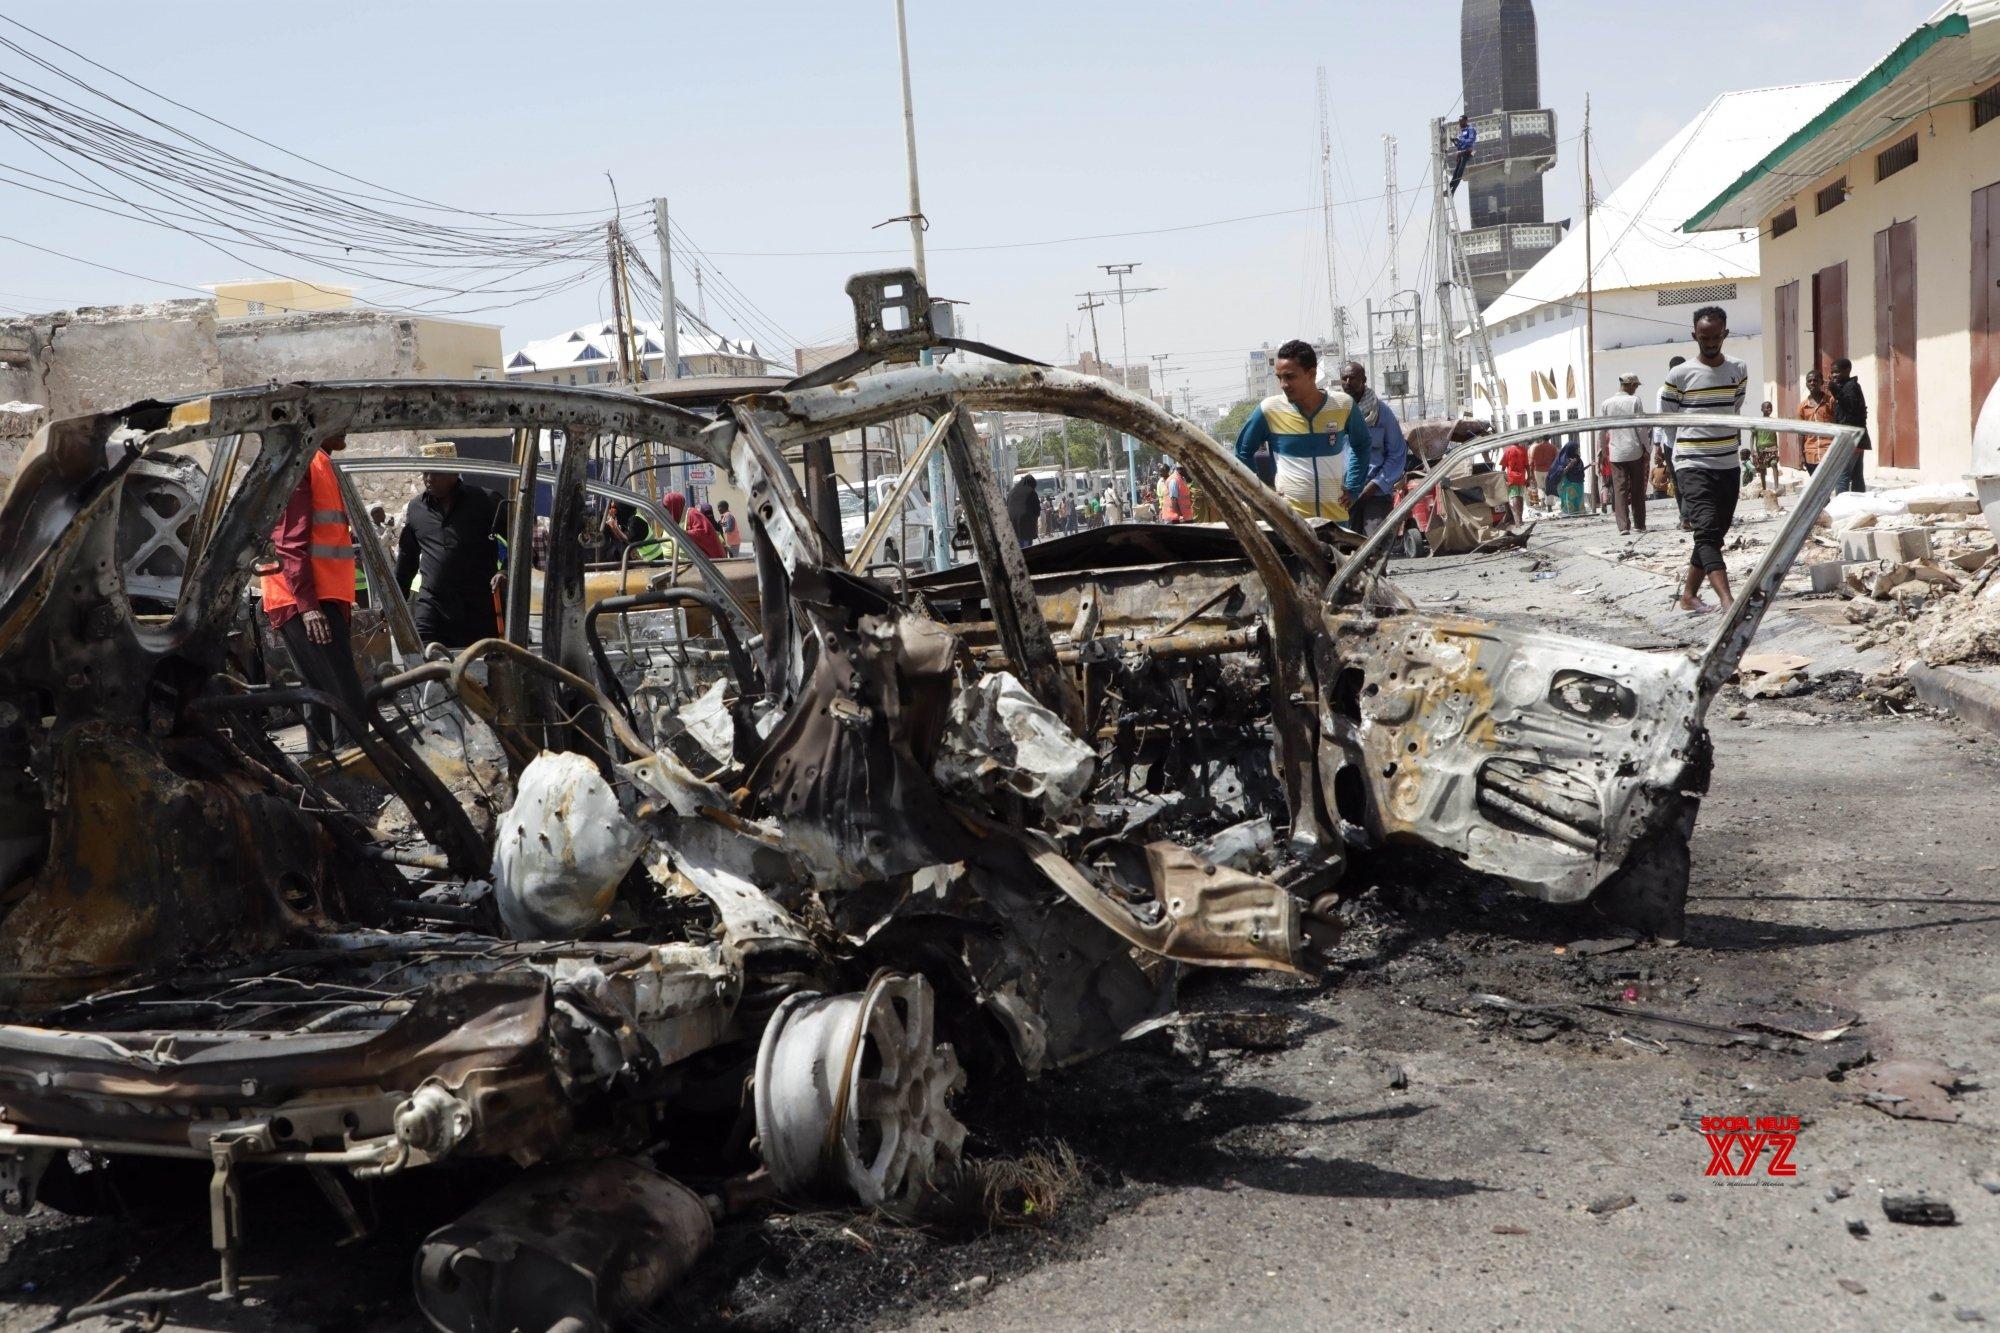 Islamic militant group al Shabaab attacks Somalia hotel, 15 dead